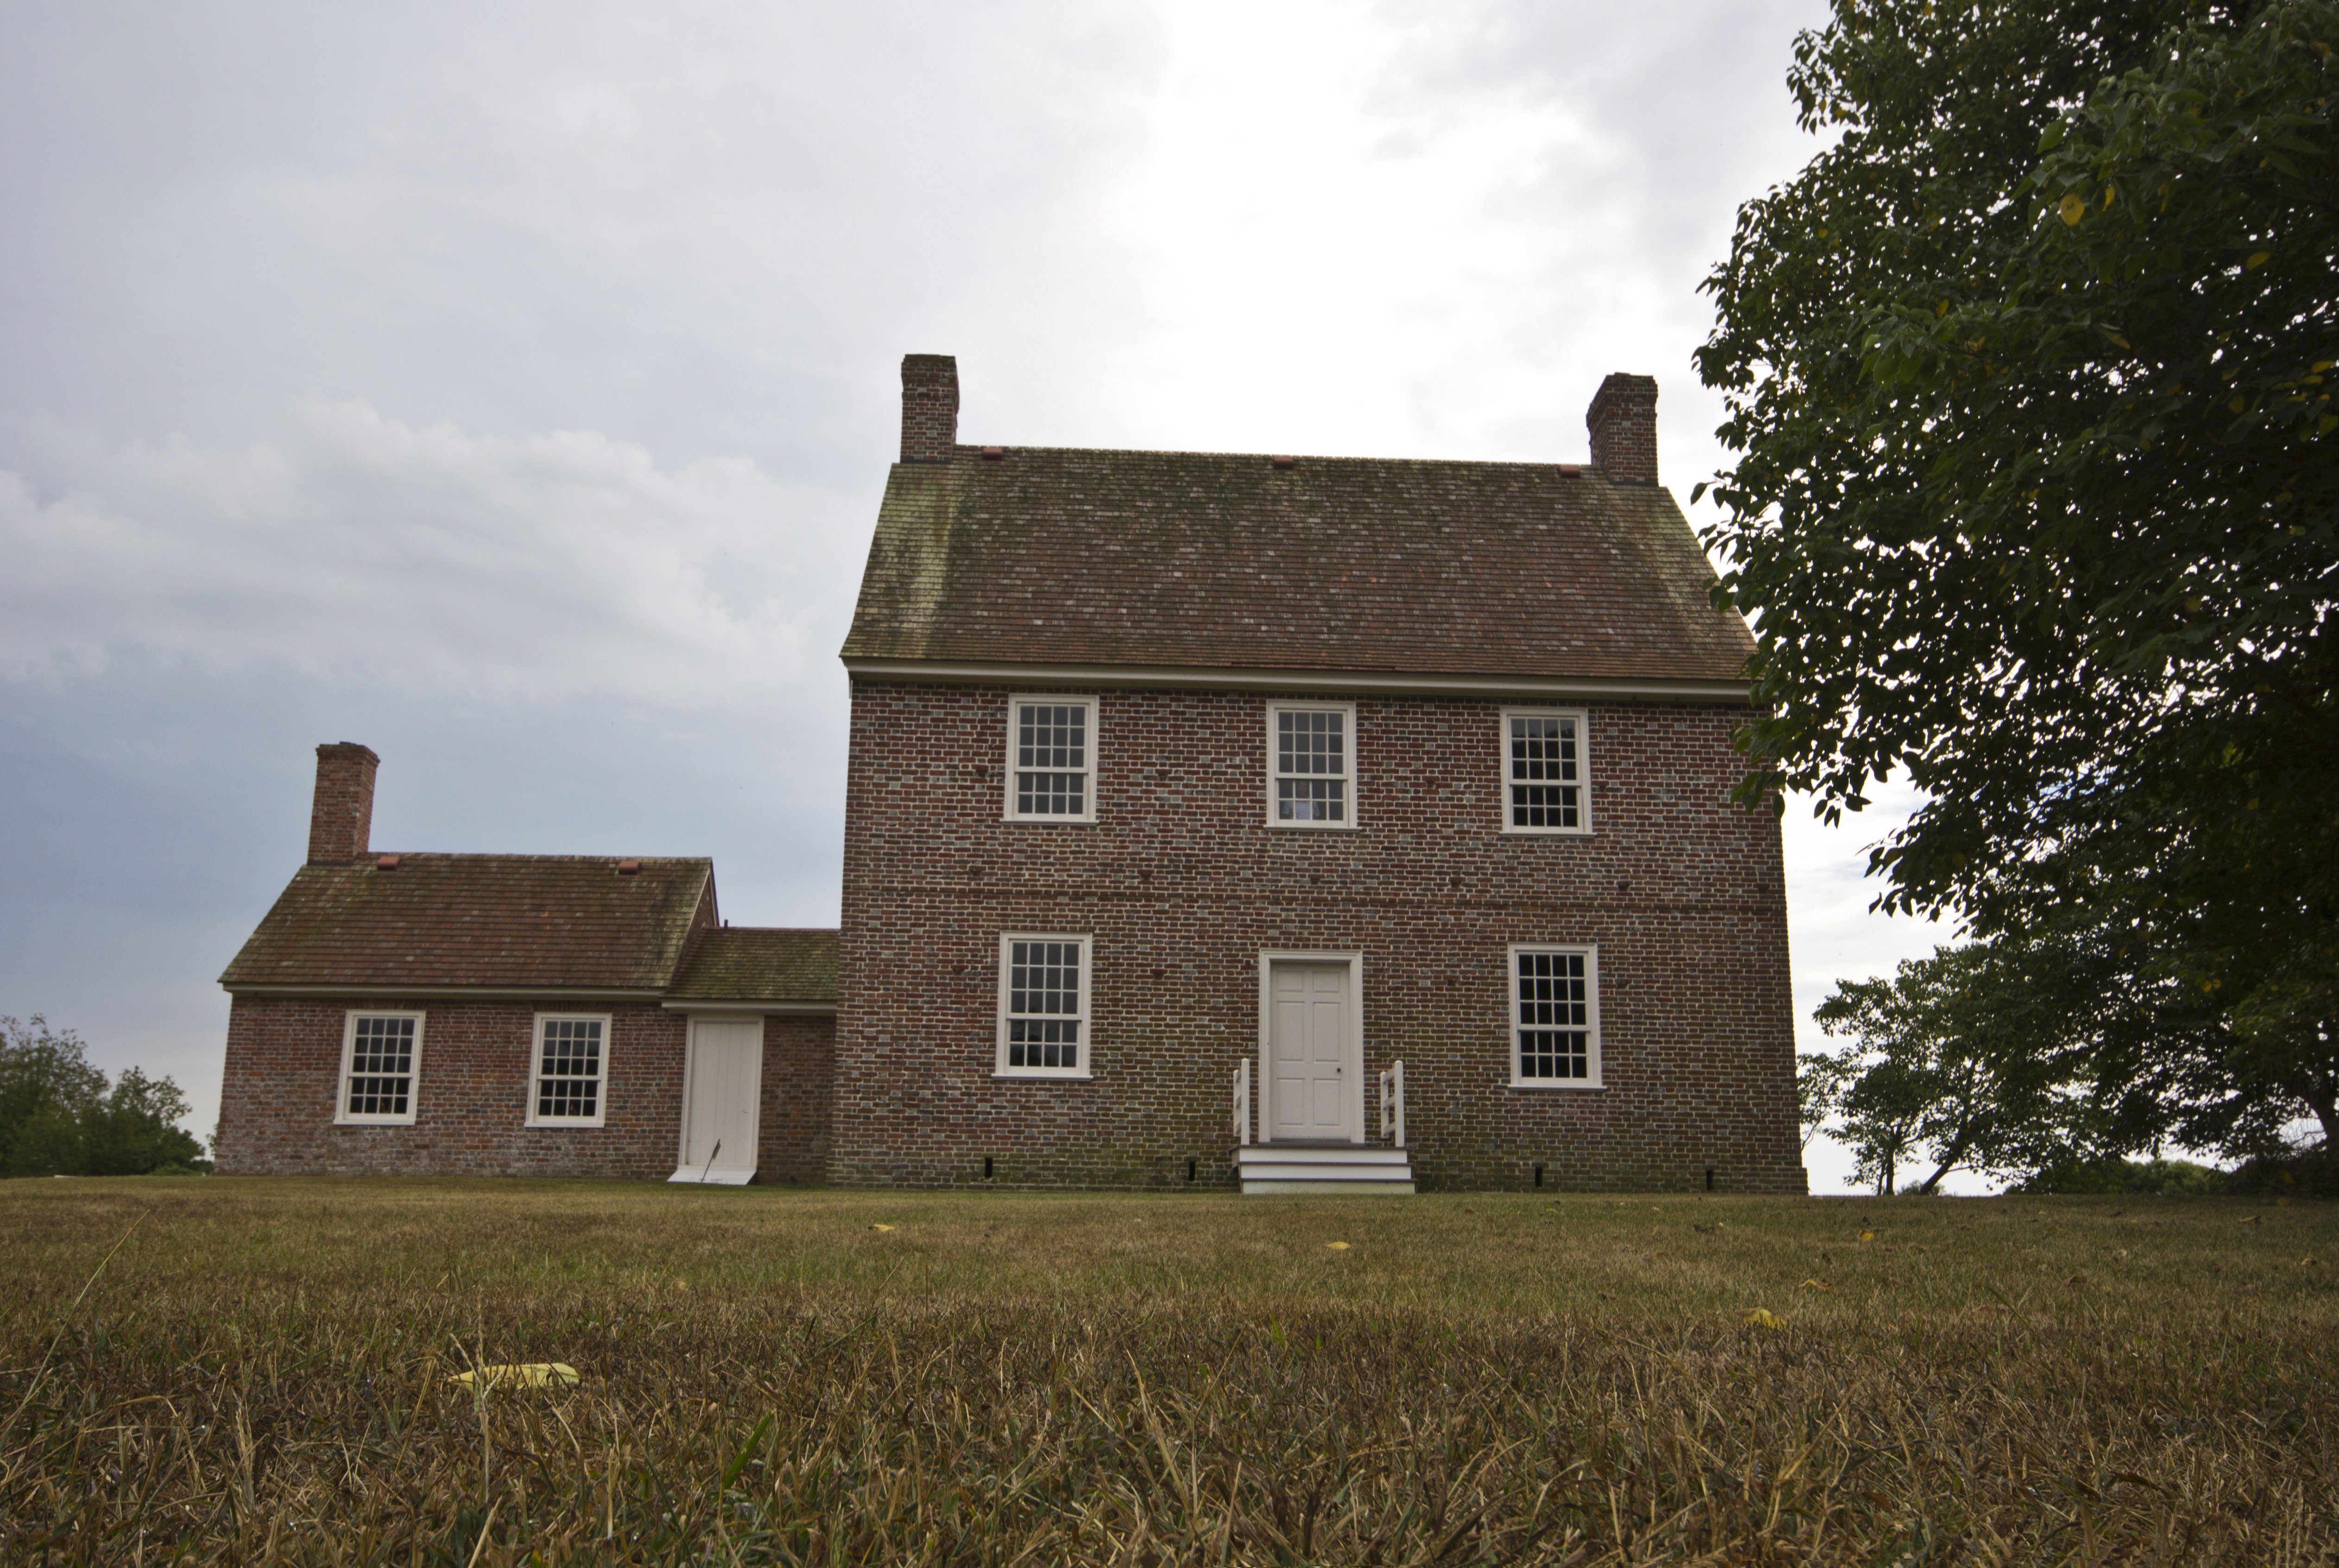 History, Restored: Visiting the Rackliffe Plantation House ... on robinson plantation house, moundsville penitentiary haunted house, rice plantation house, miller plantation house,